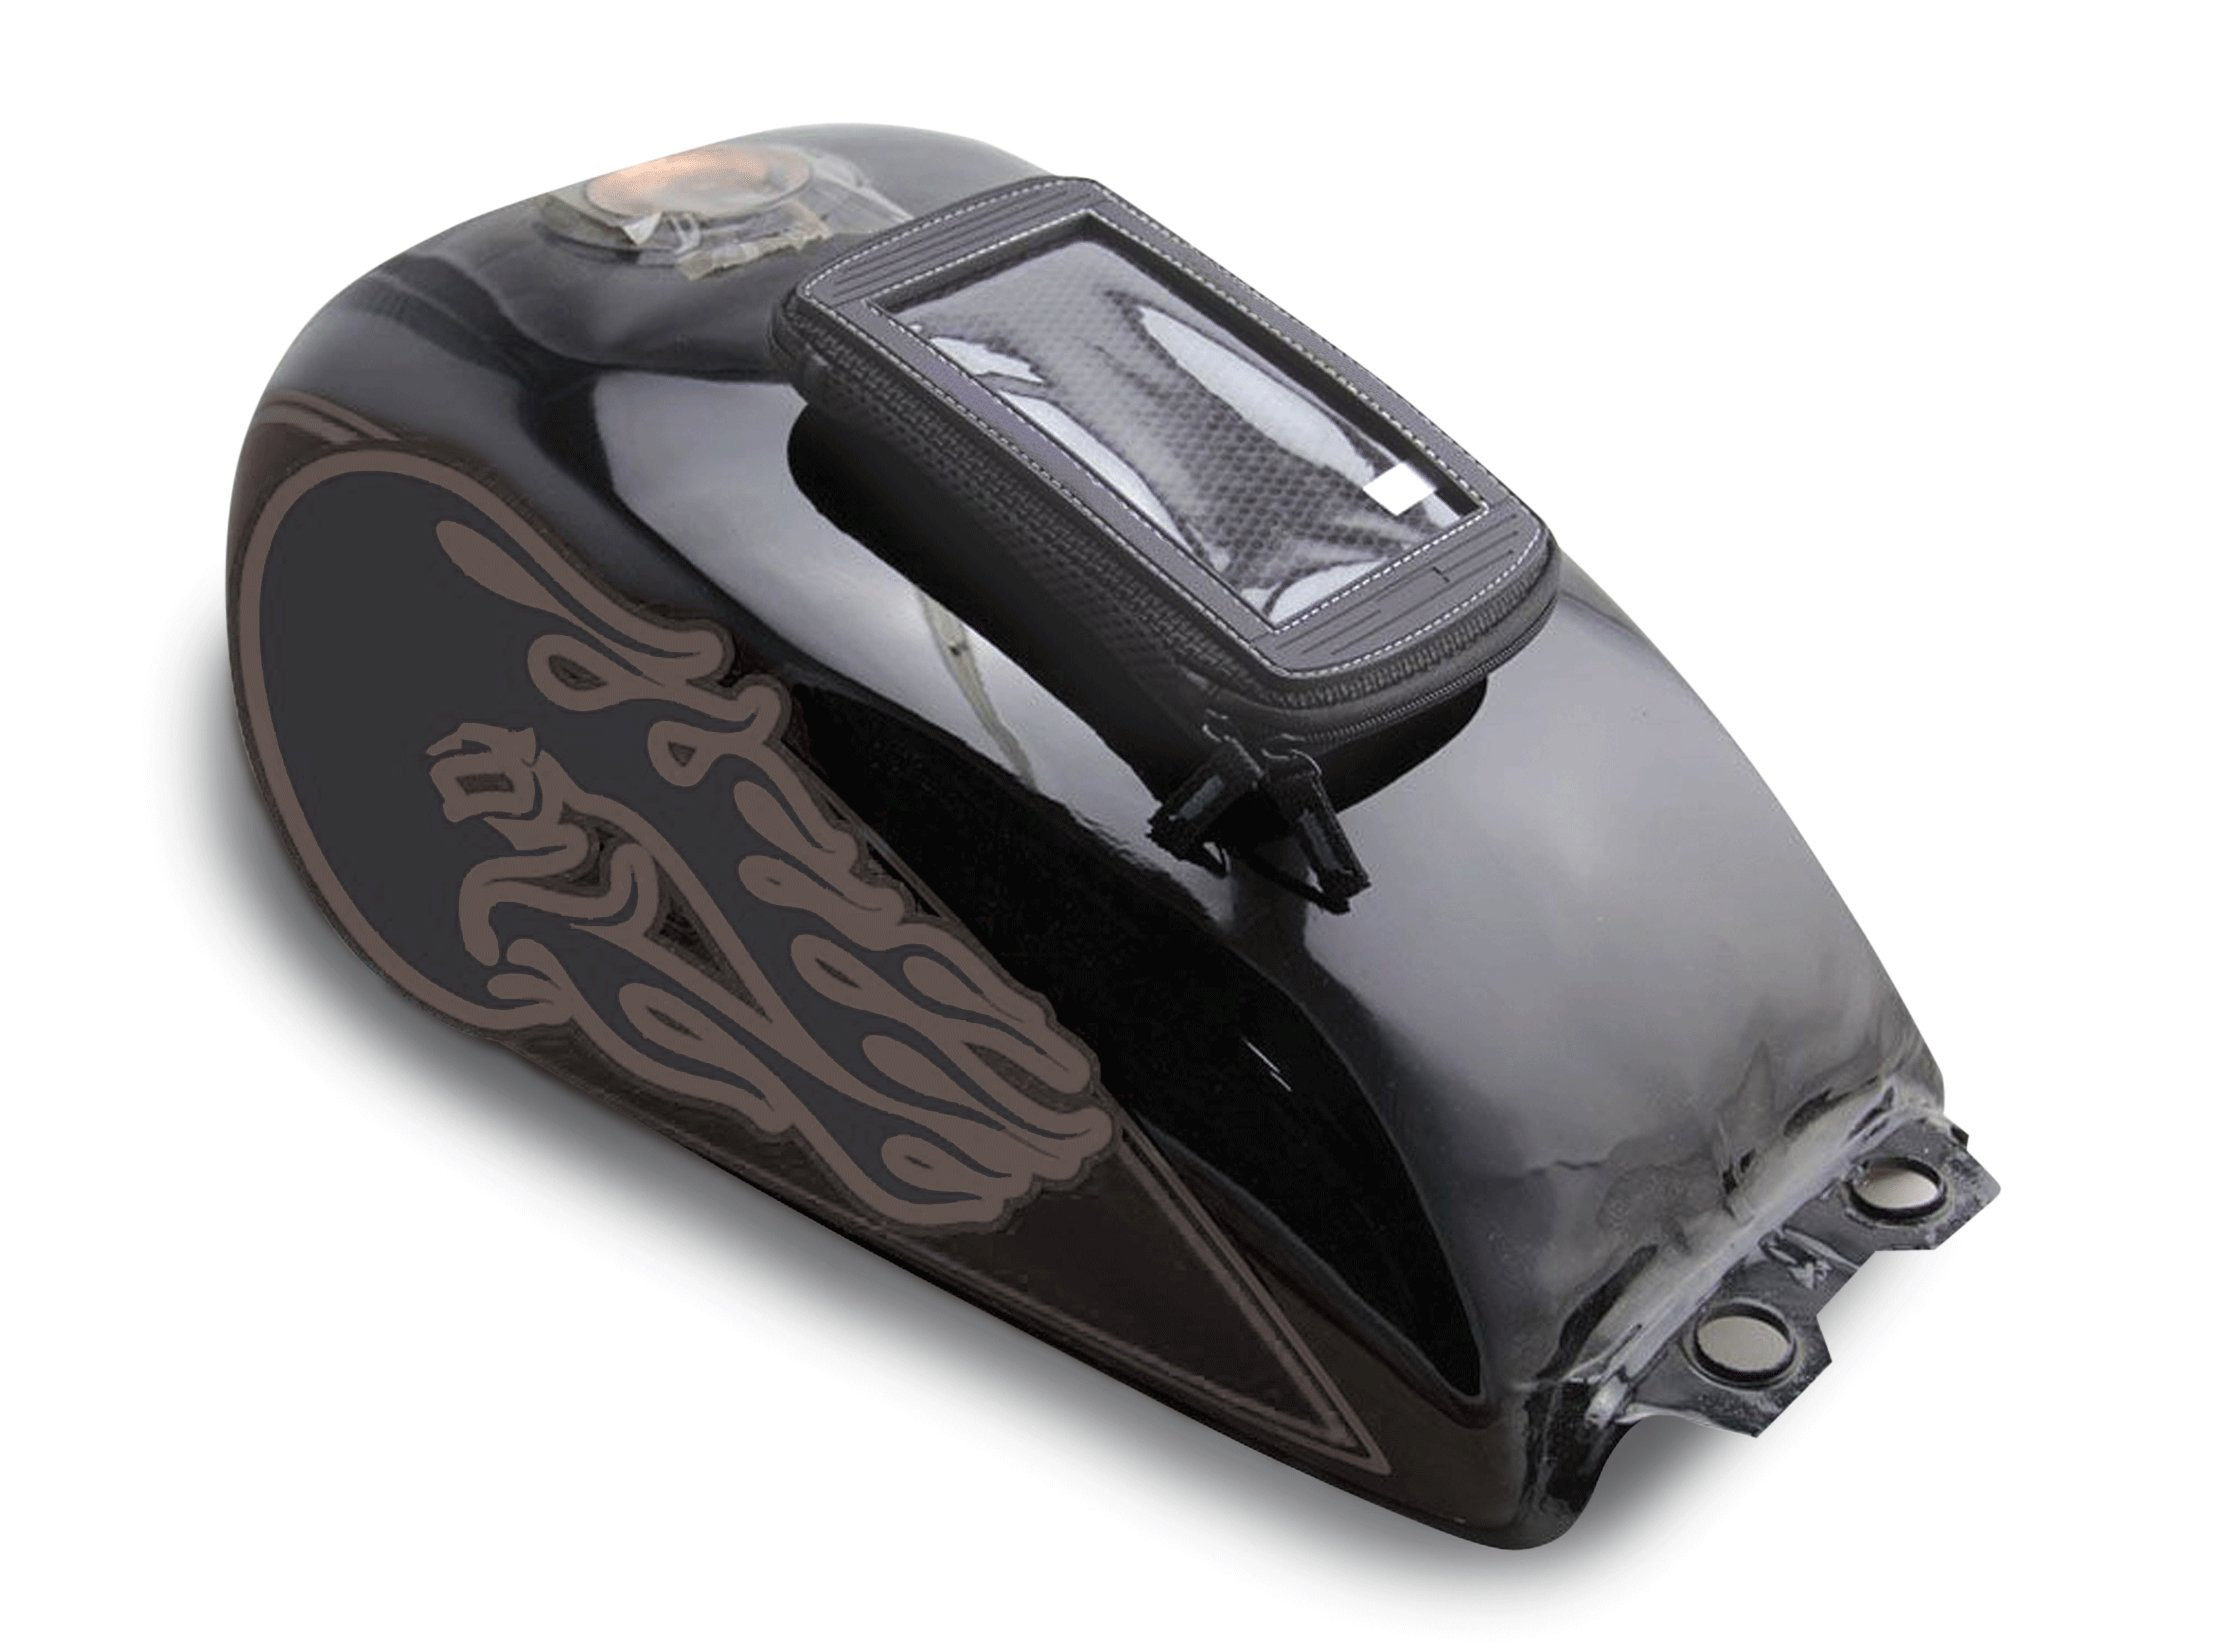 Bikers Shield MP-105 Black 6'' x 1'' x 4'' Magnetic Tank Holder for Smartphones